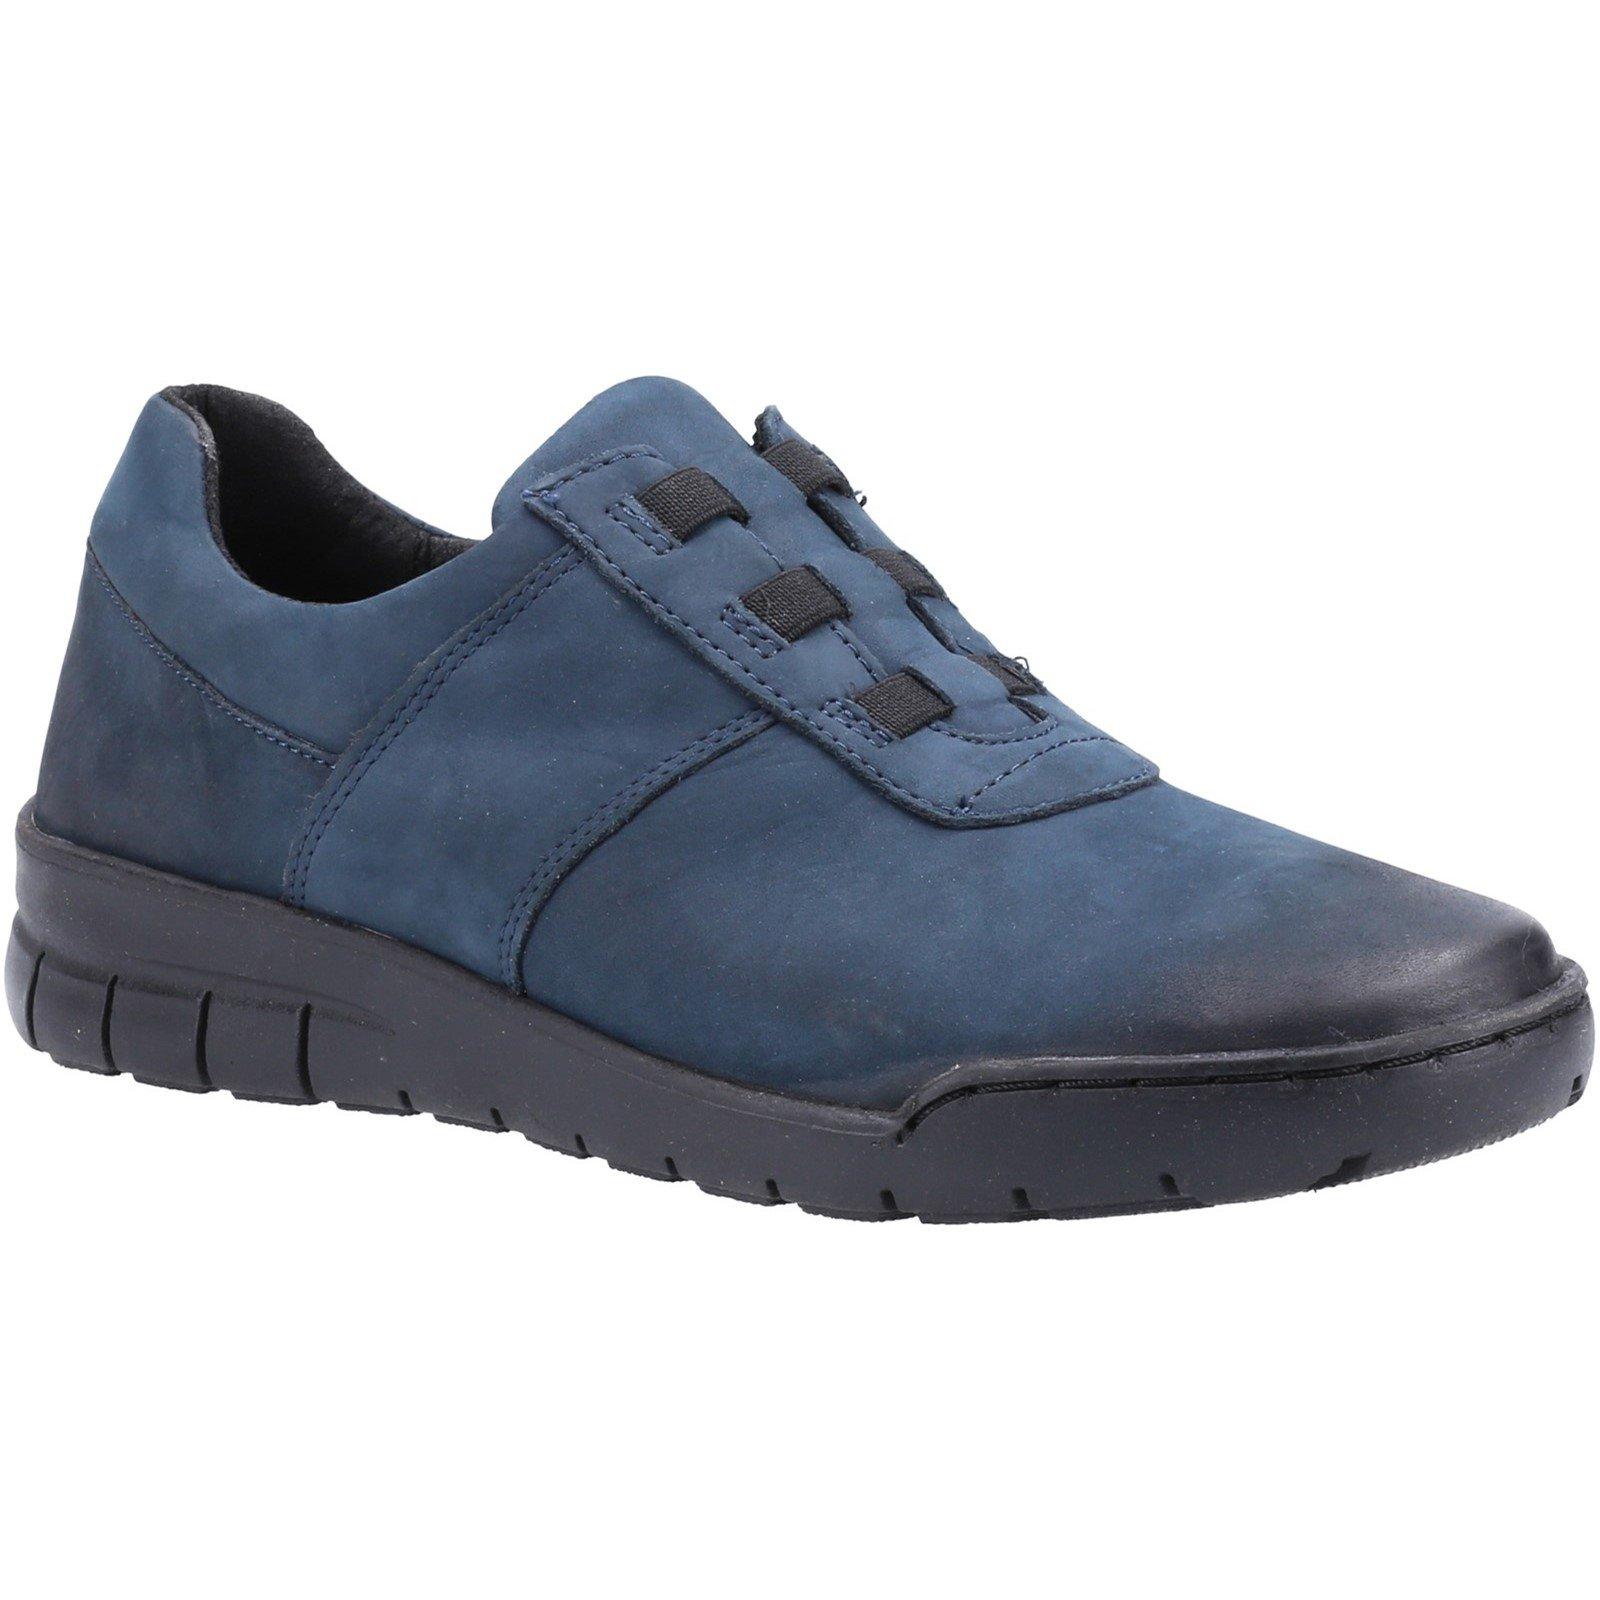 Fleet & Foster Women's Cristianos Slip On Shoe Various Colours 33015 - Navy 3